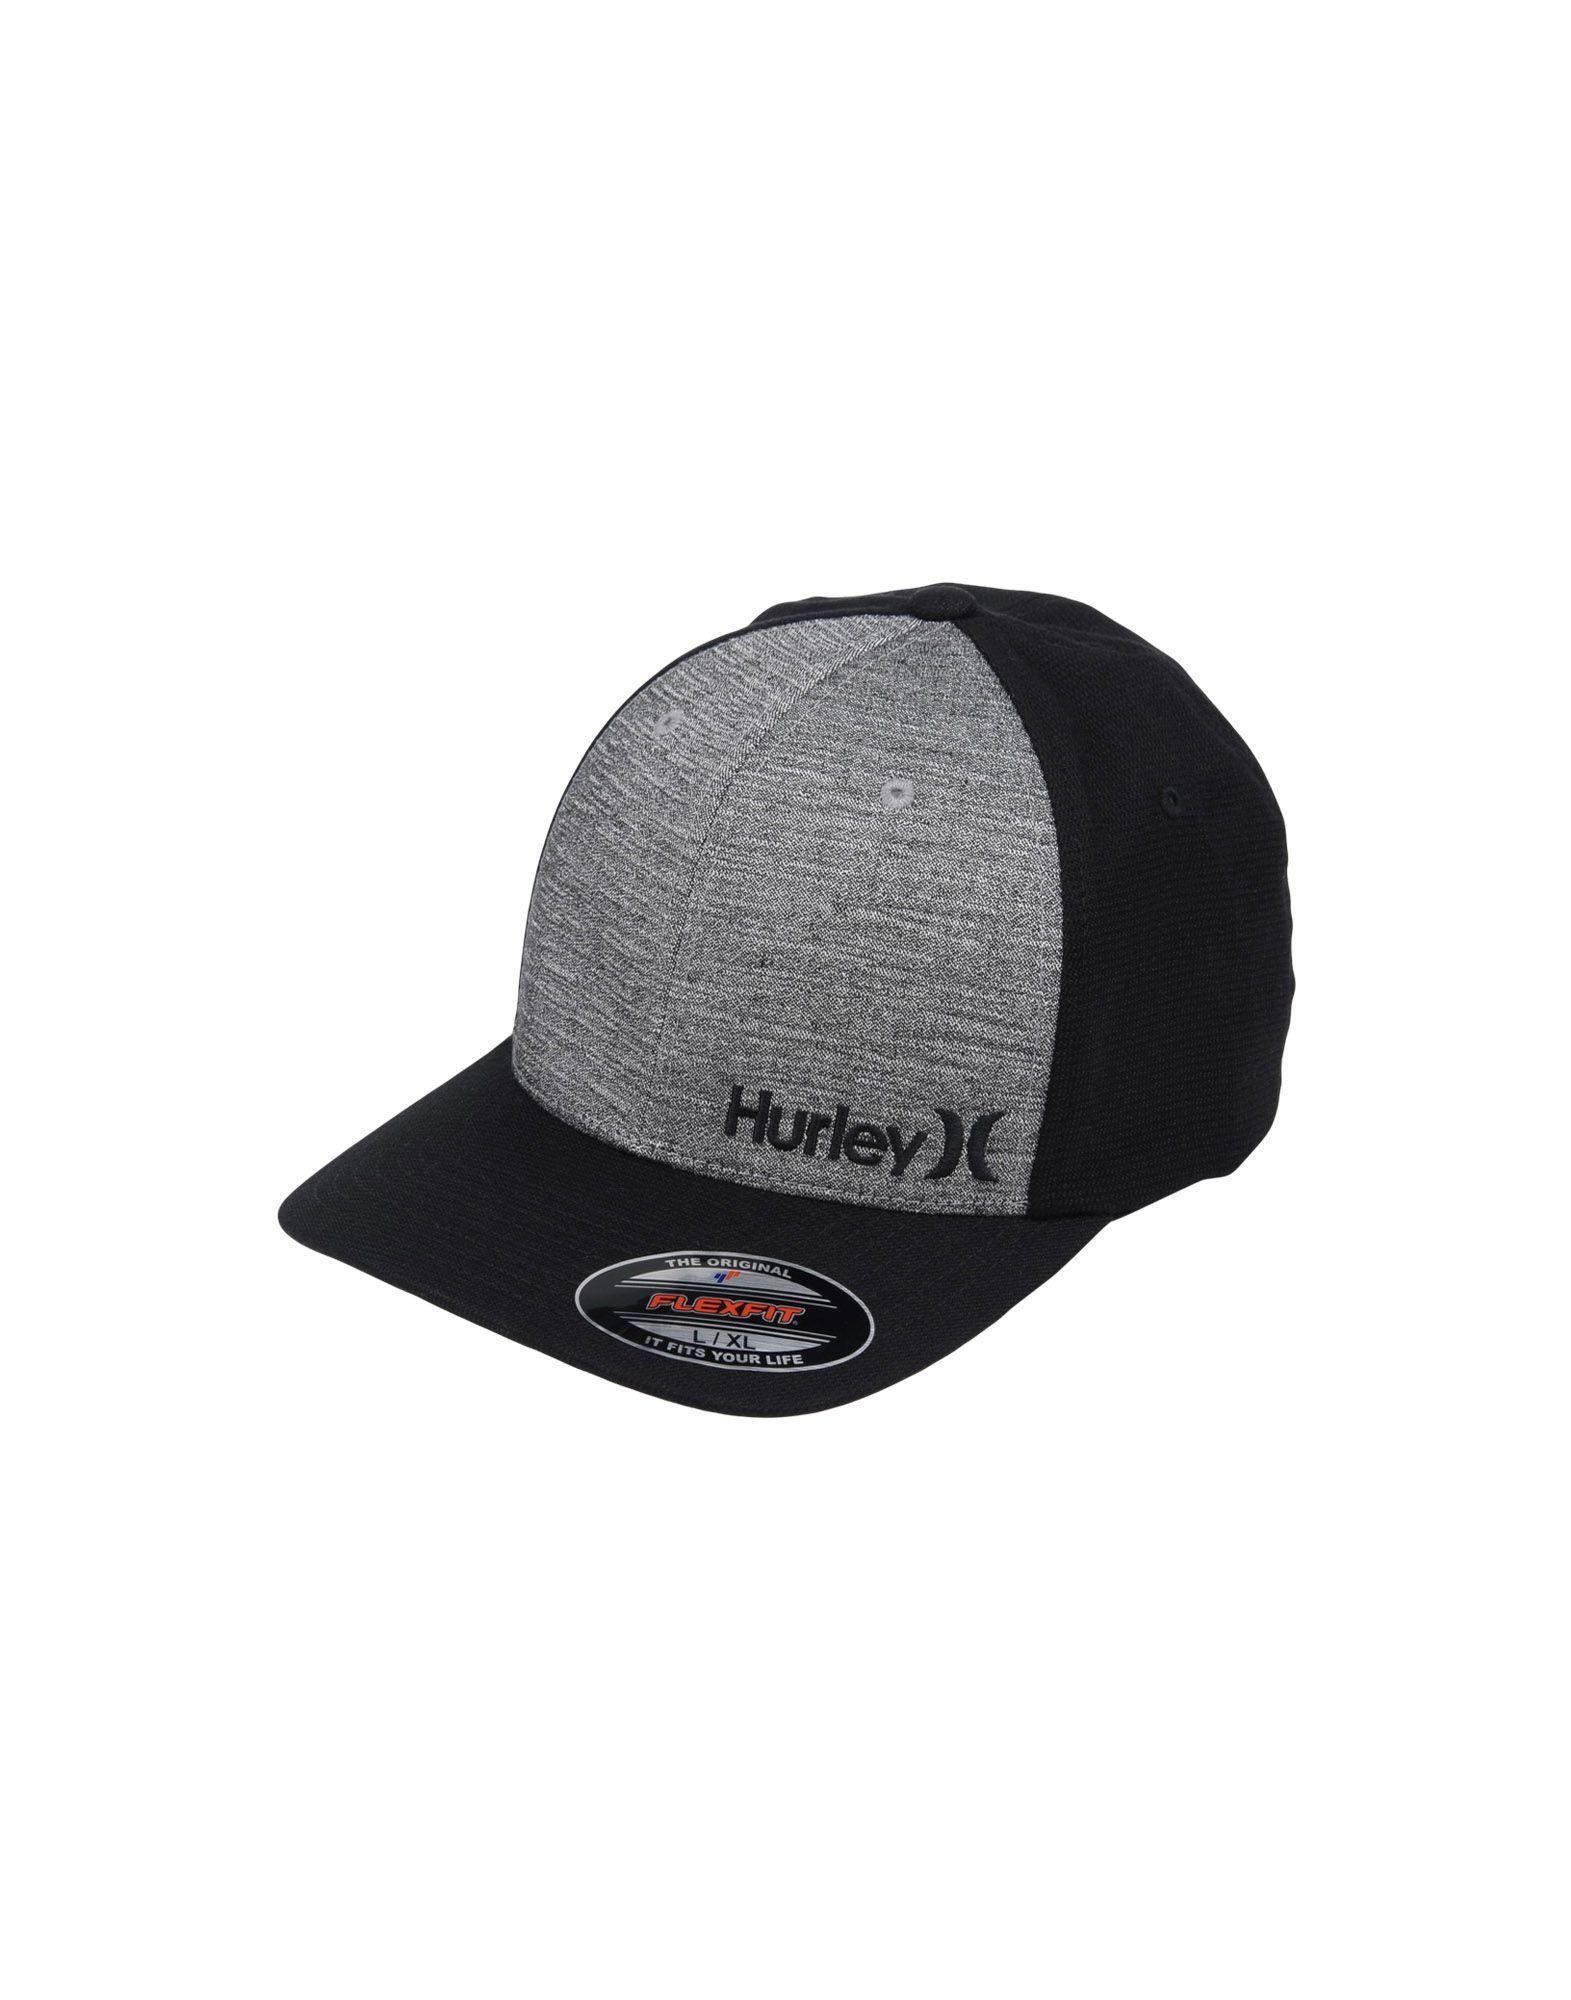 df45c0cb9 Hurley Hat - Men Hurley Hats online on YOOX Hong Kong - 46541771